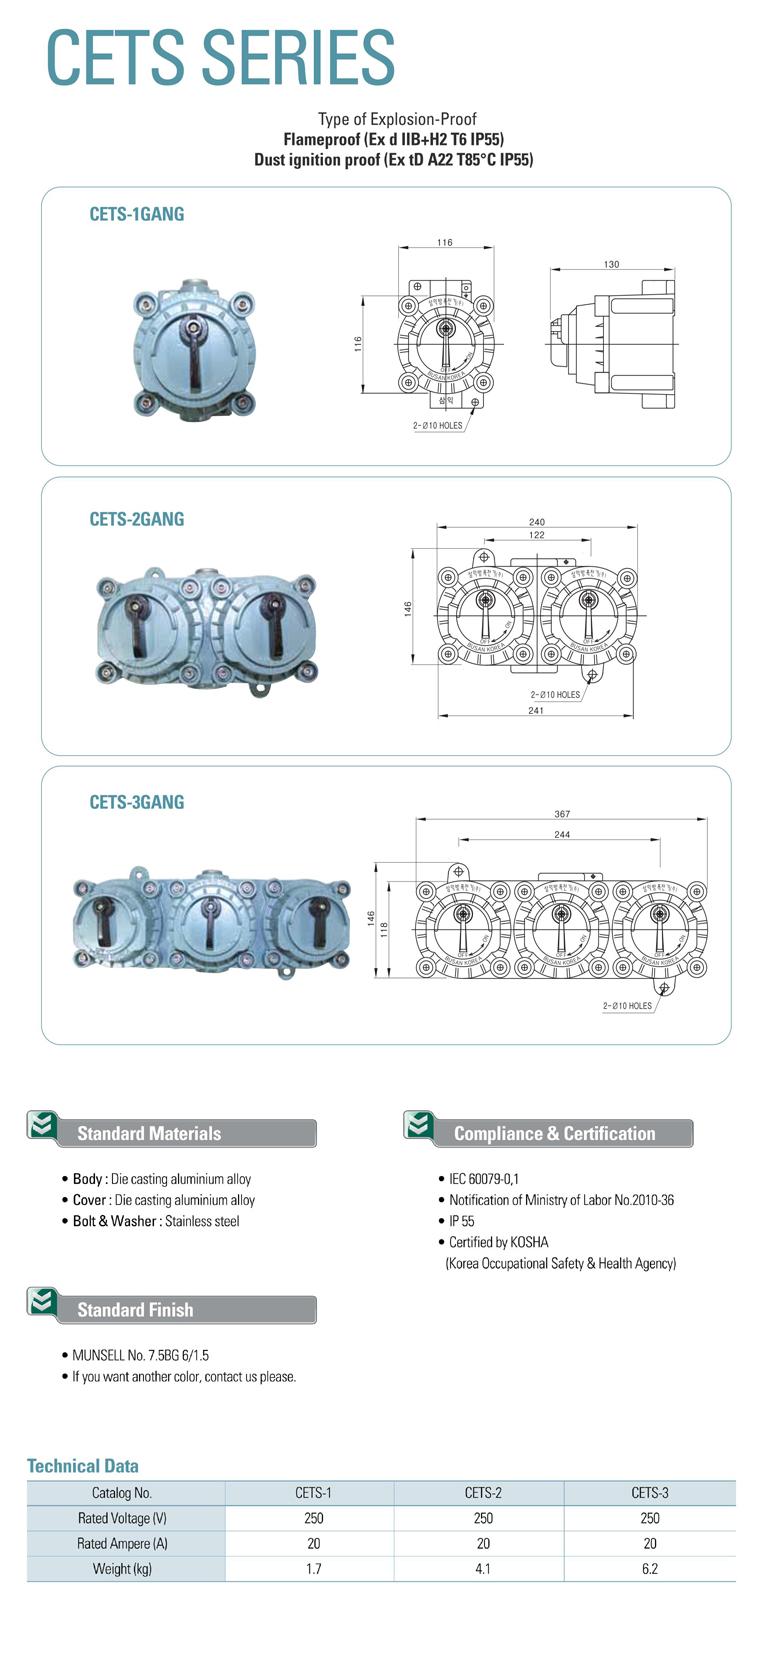 Samik Explosi Onproof Elxctric  CETS Series